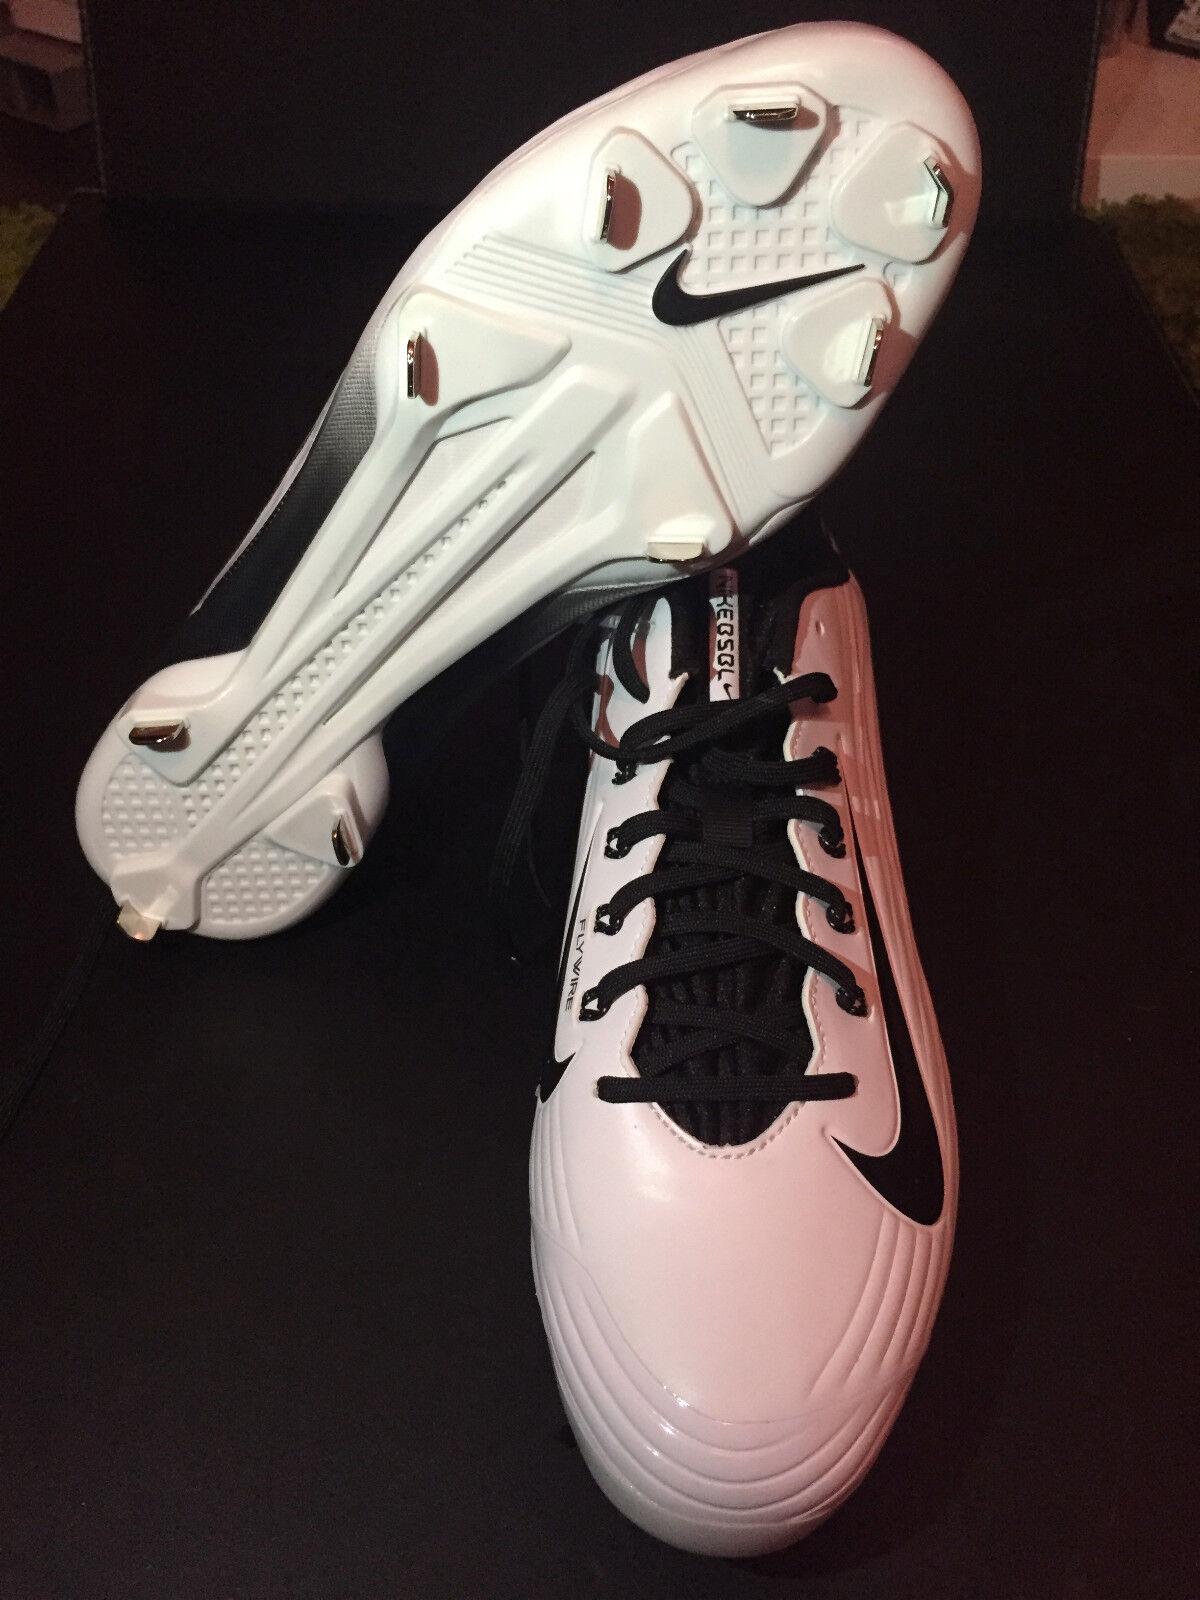 9c0218ba5 Nike Lunar Vapor Pro Low Sz 12 Black White Baseball Metal Cleats Shoes for  sale online